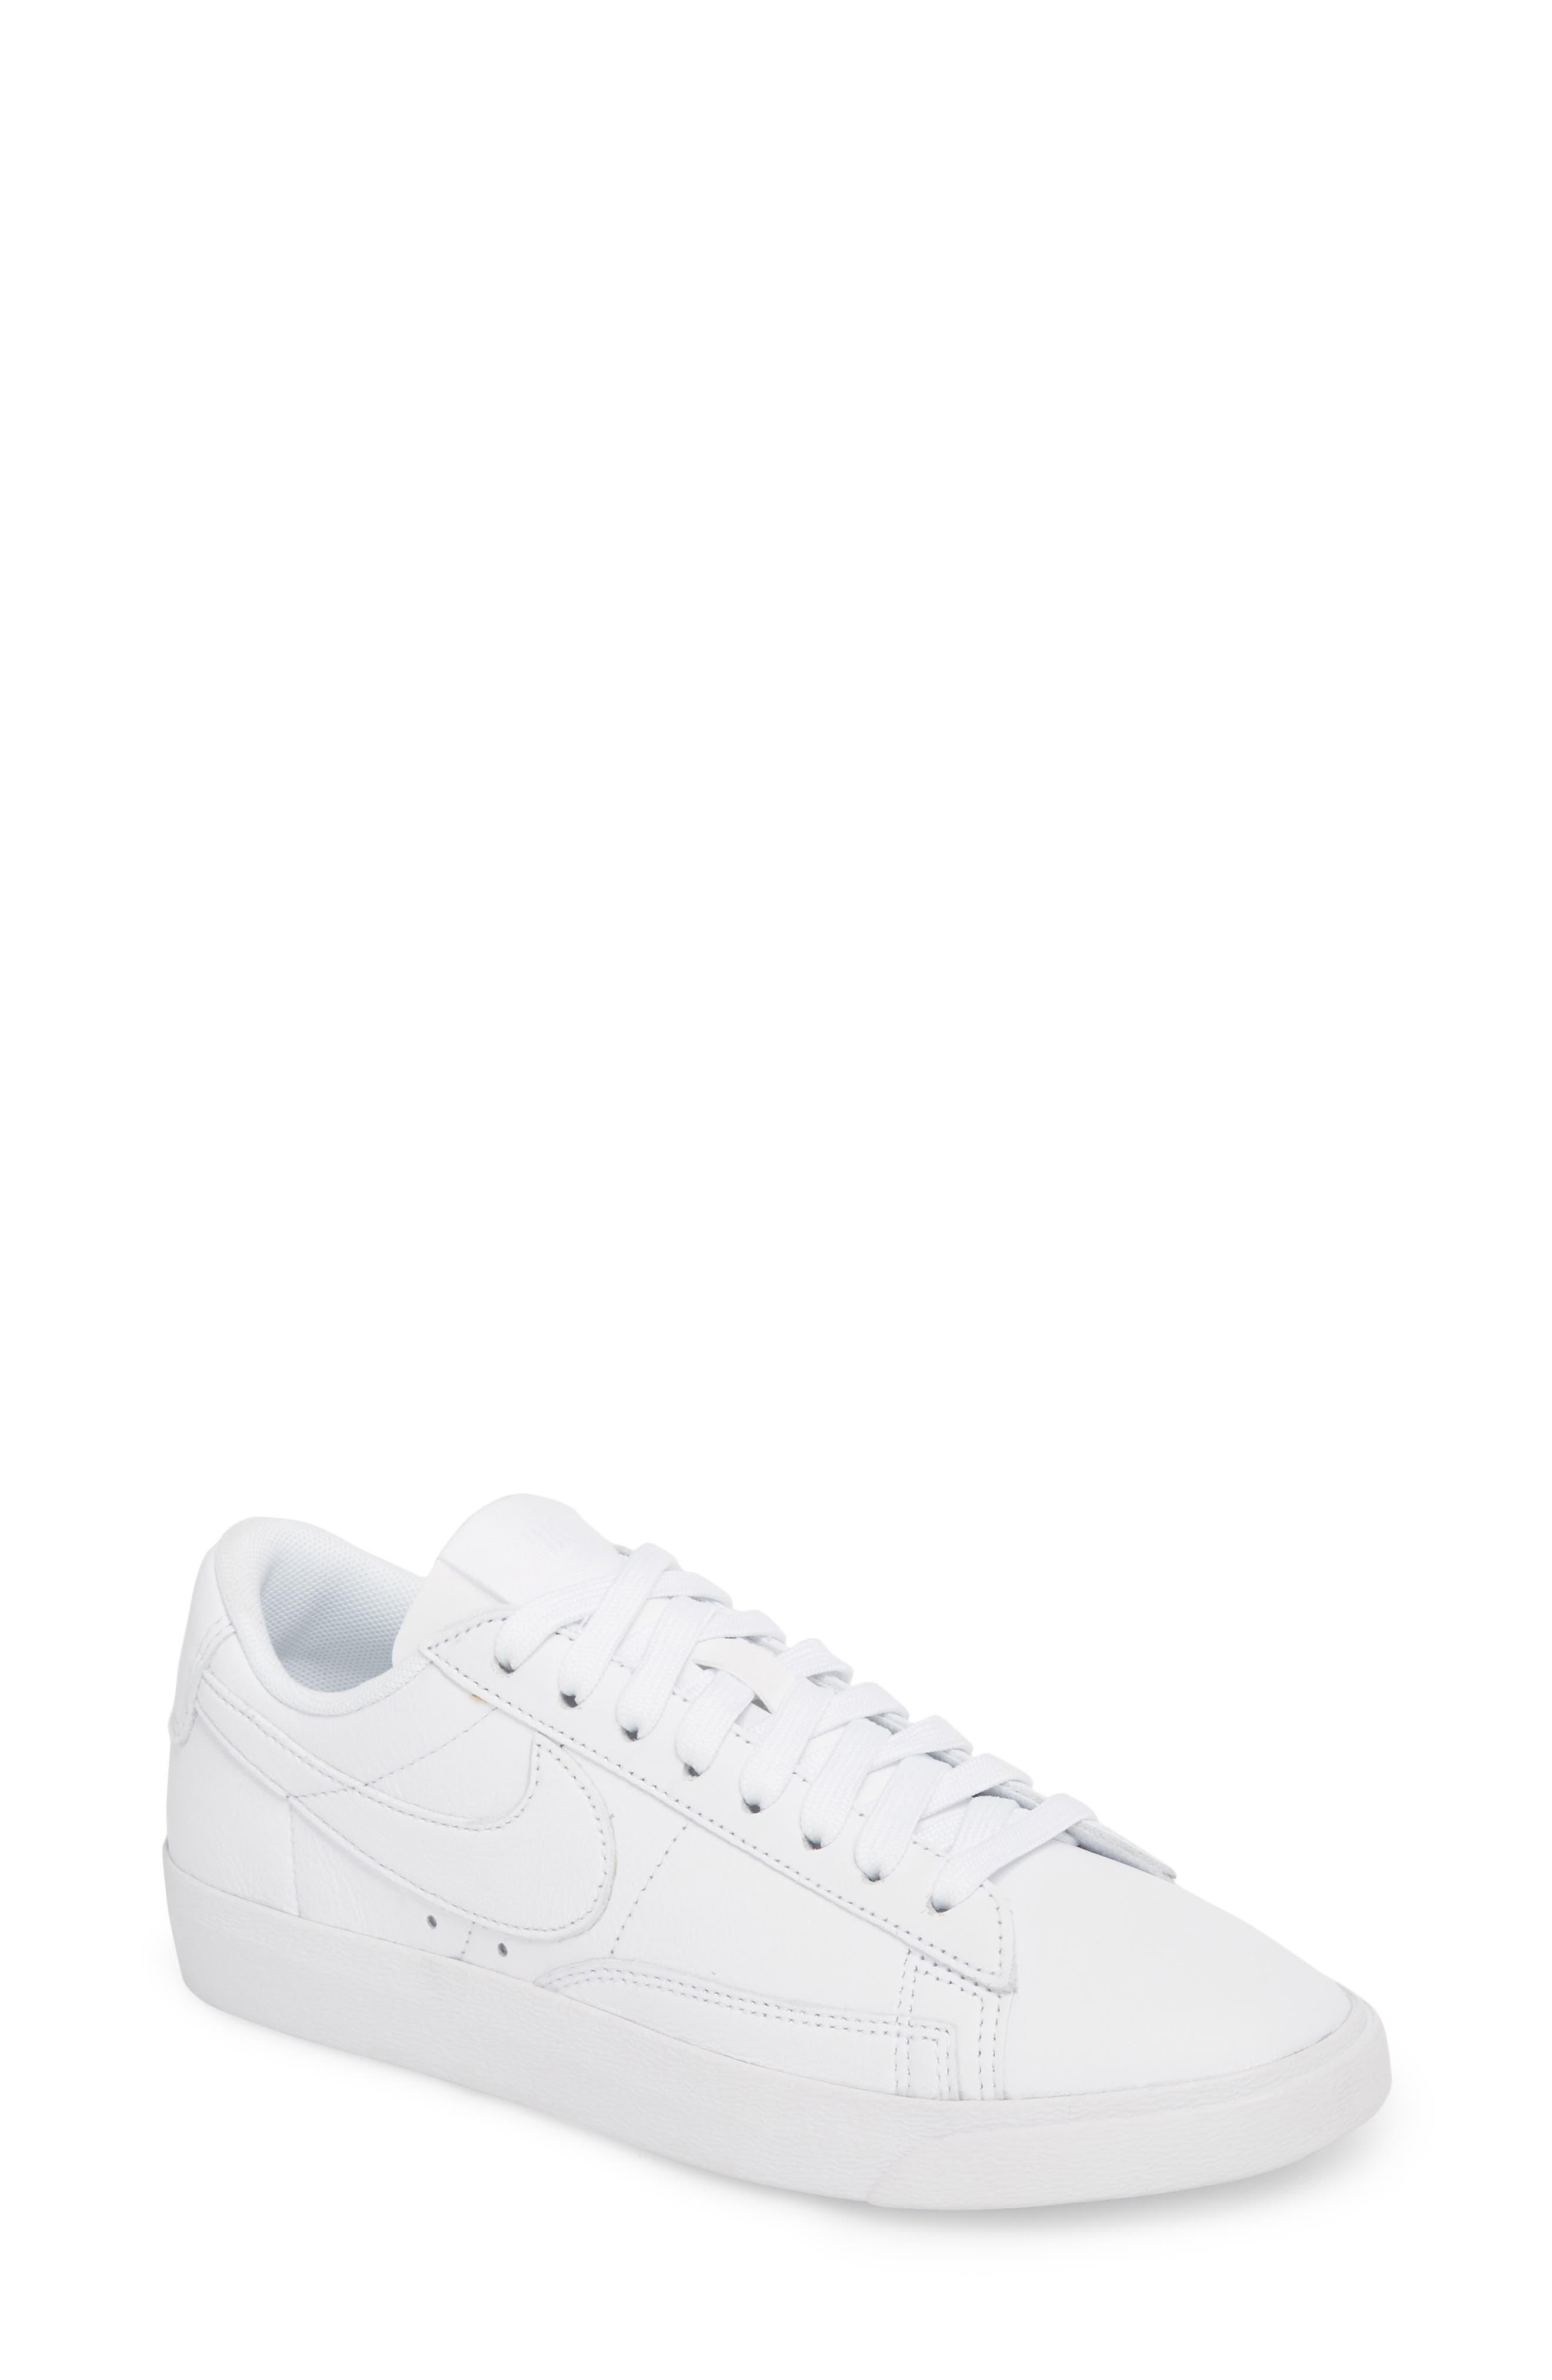 Blazer Low LE Sneaker,                             Main thumbnail 1, color,                             WHITE/ WHITE-WHITE